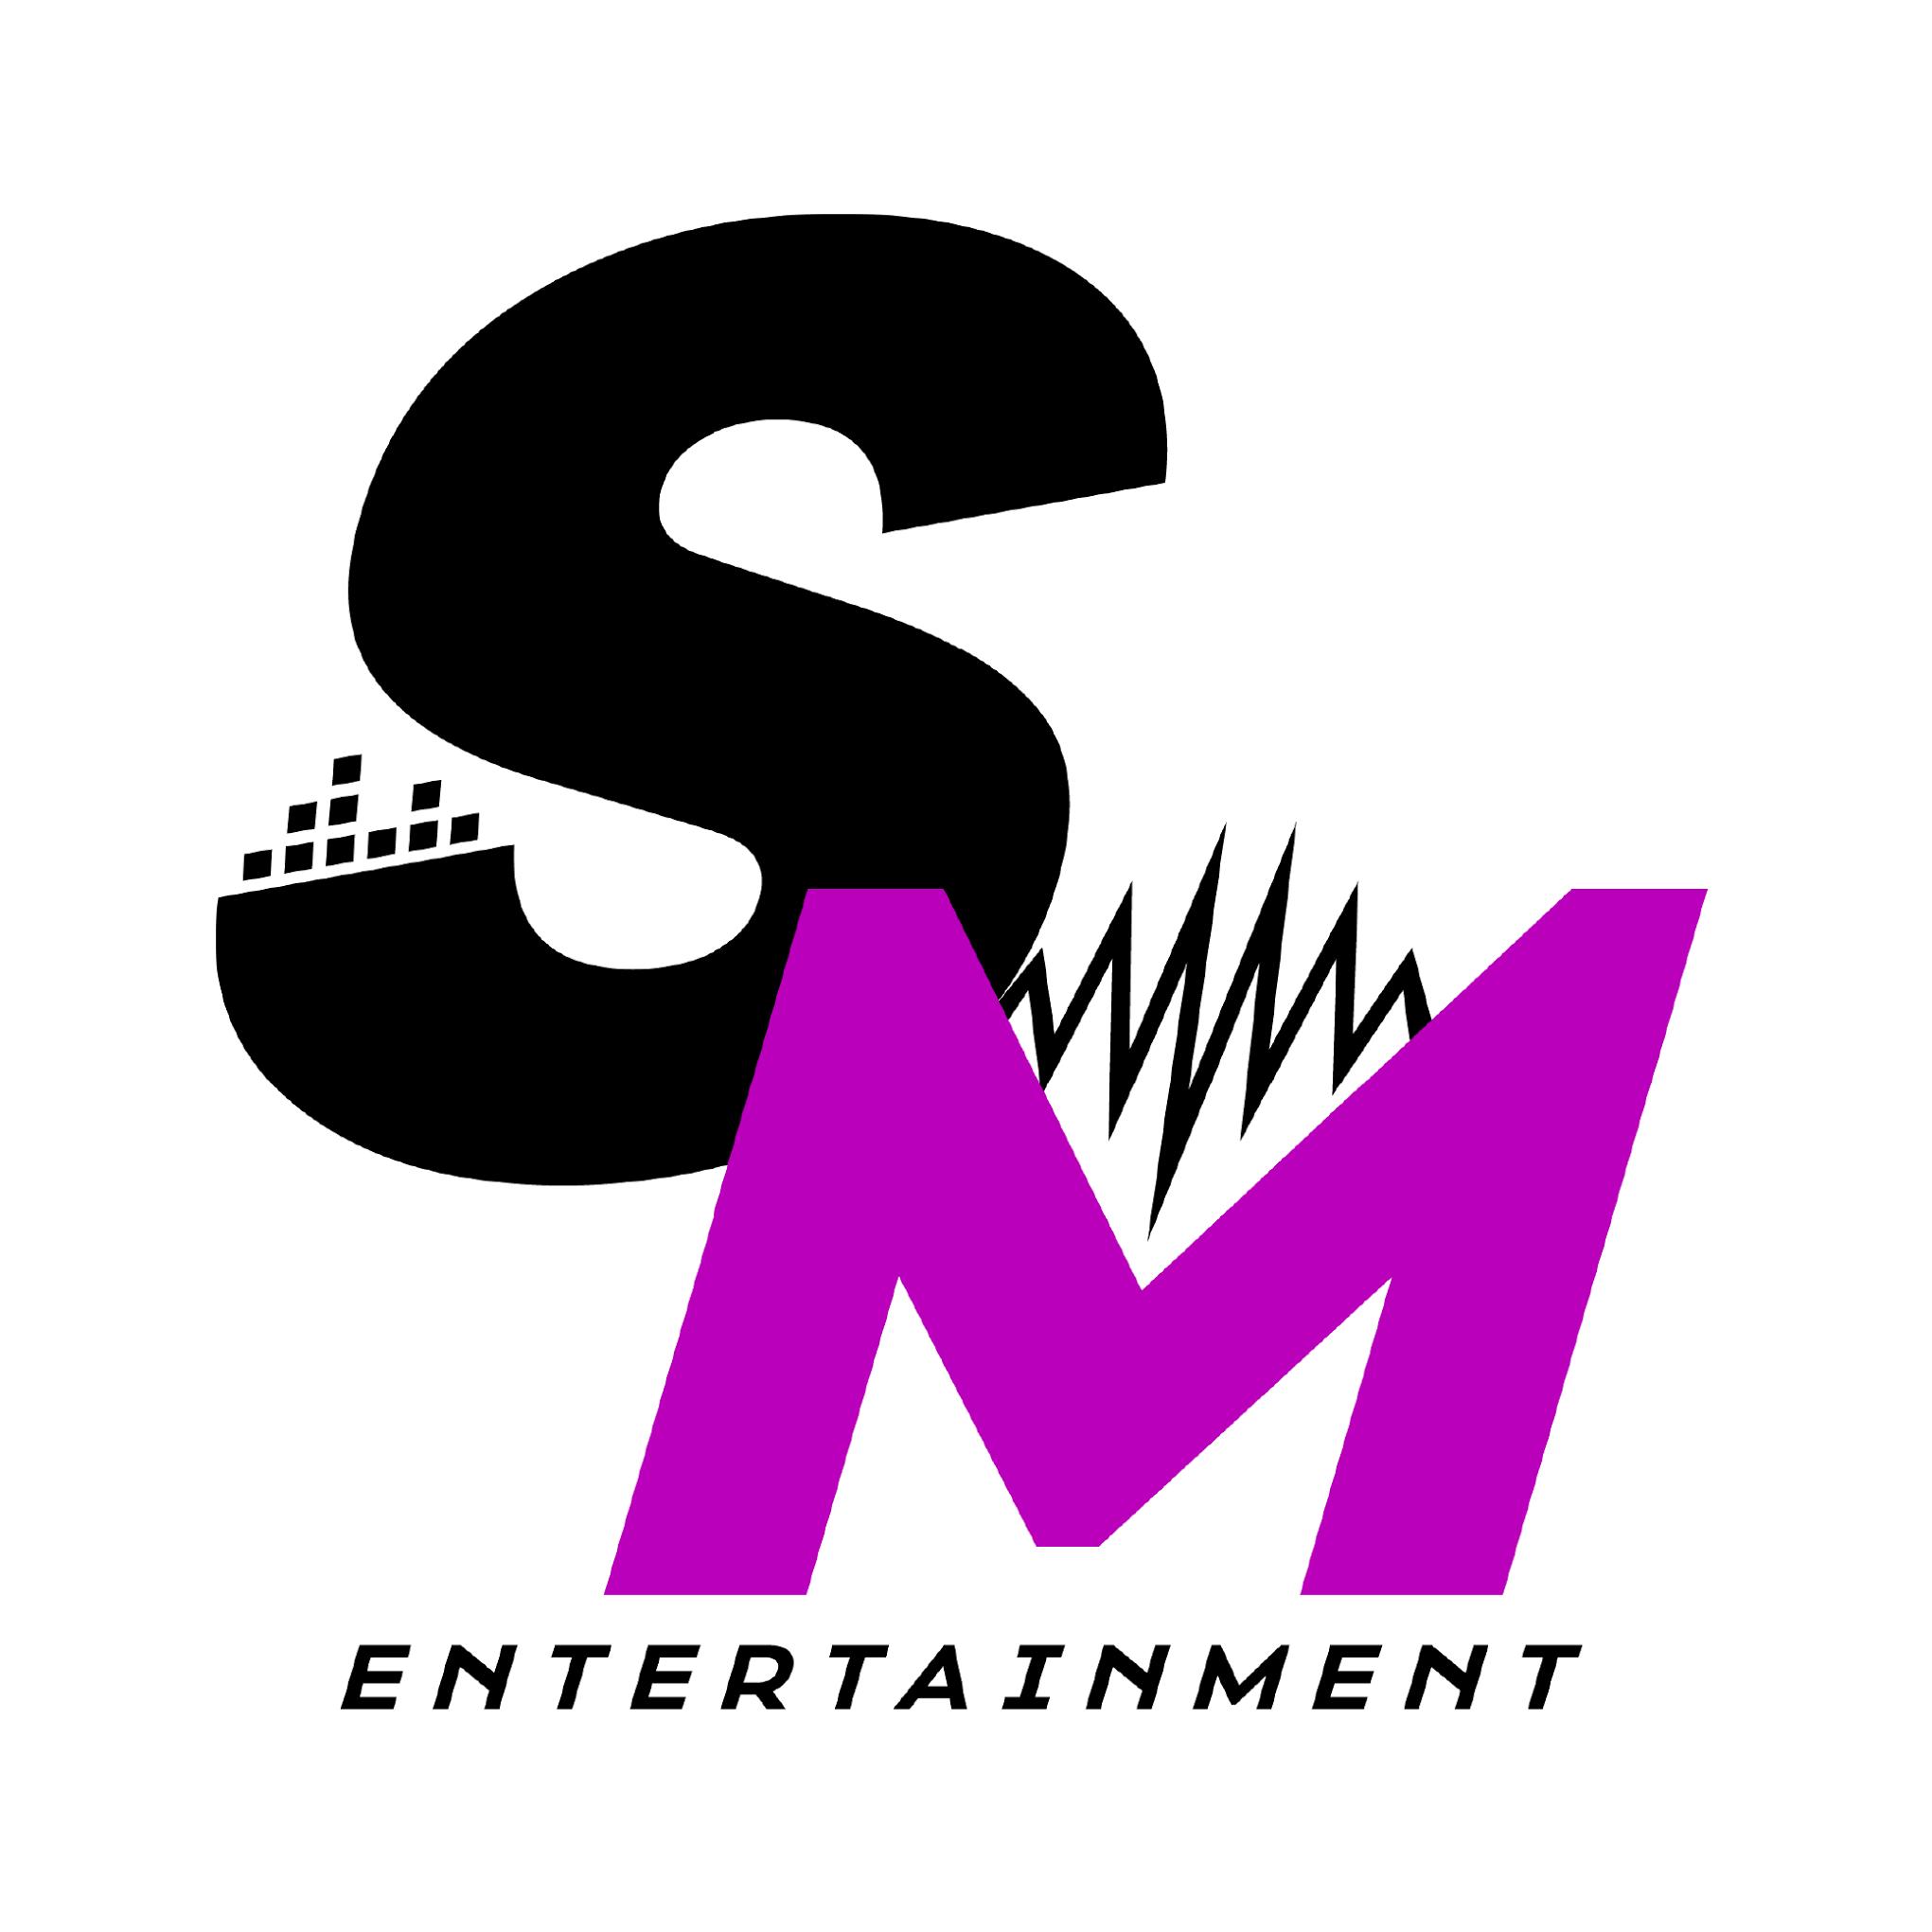 Supermix Entertainment - Fresh Meadows, NY - Entertainers